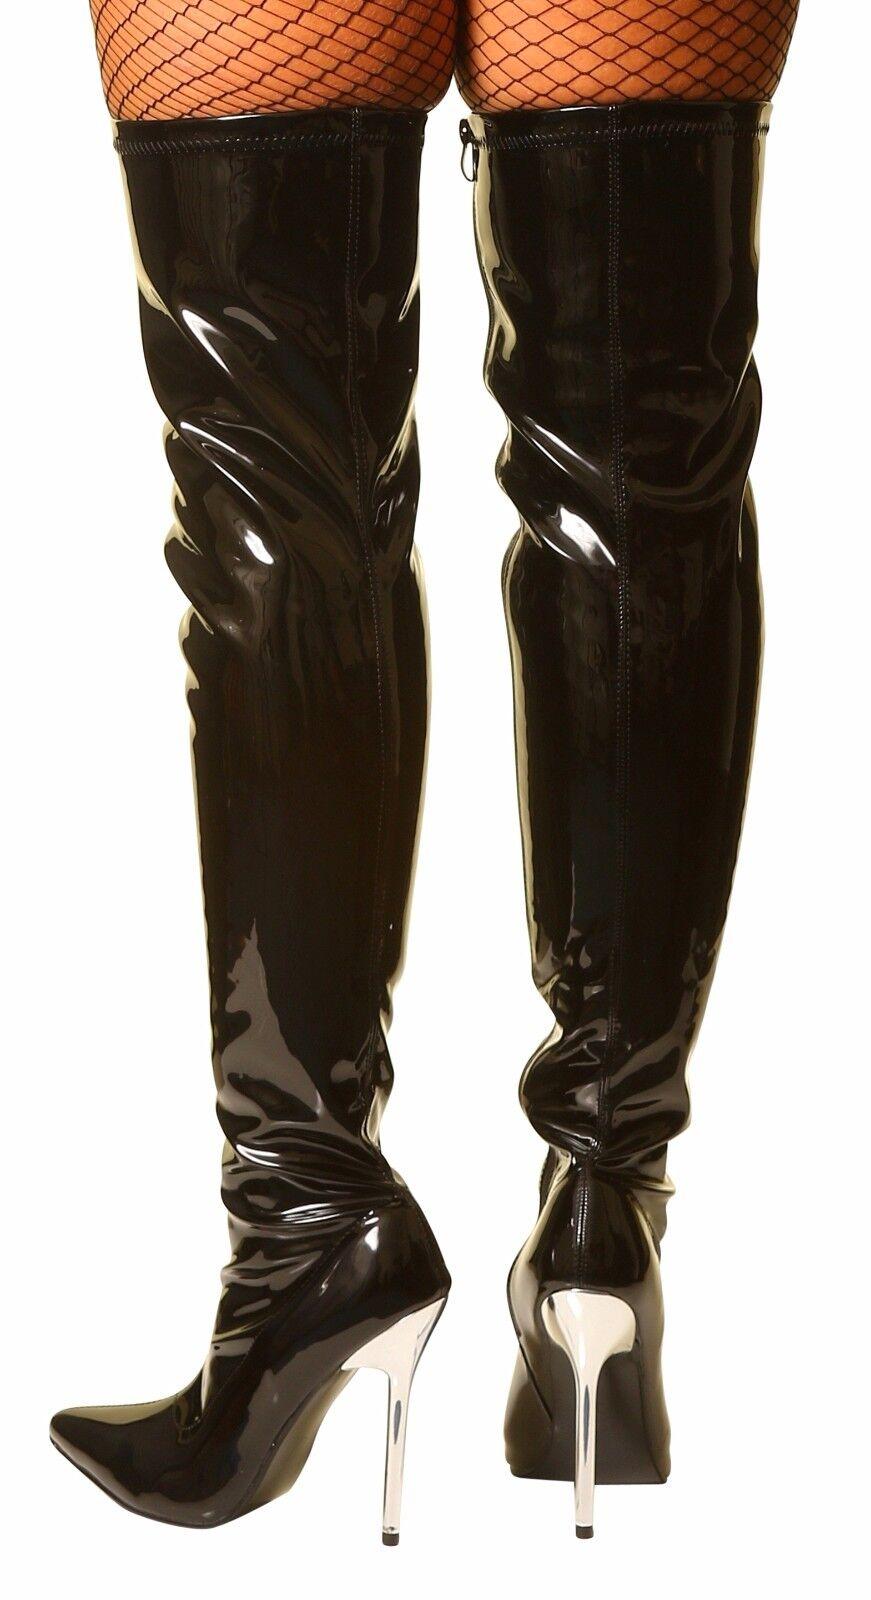 Damenstiefel Sexy Schwarz Lackstiefel Overkneestiefel Rot Weiß Schwarz Sexy Stiletto-Stiefel 3fad46